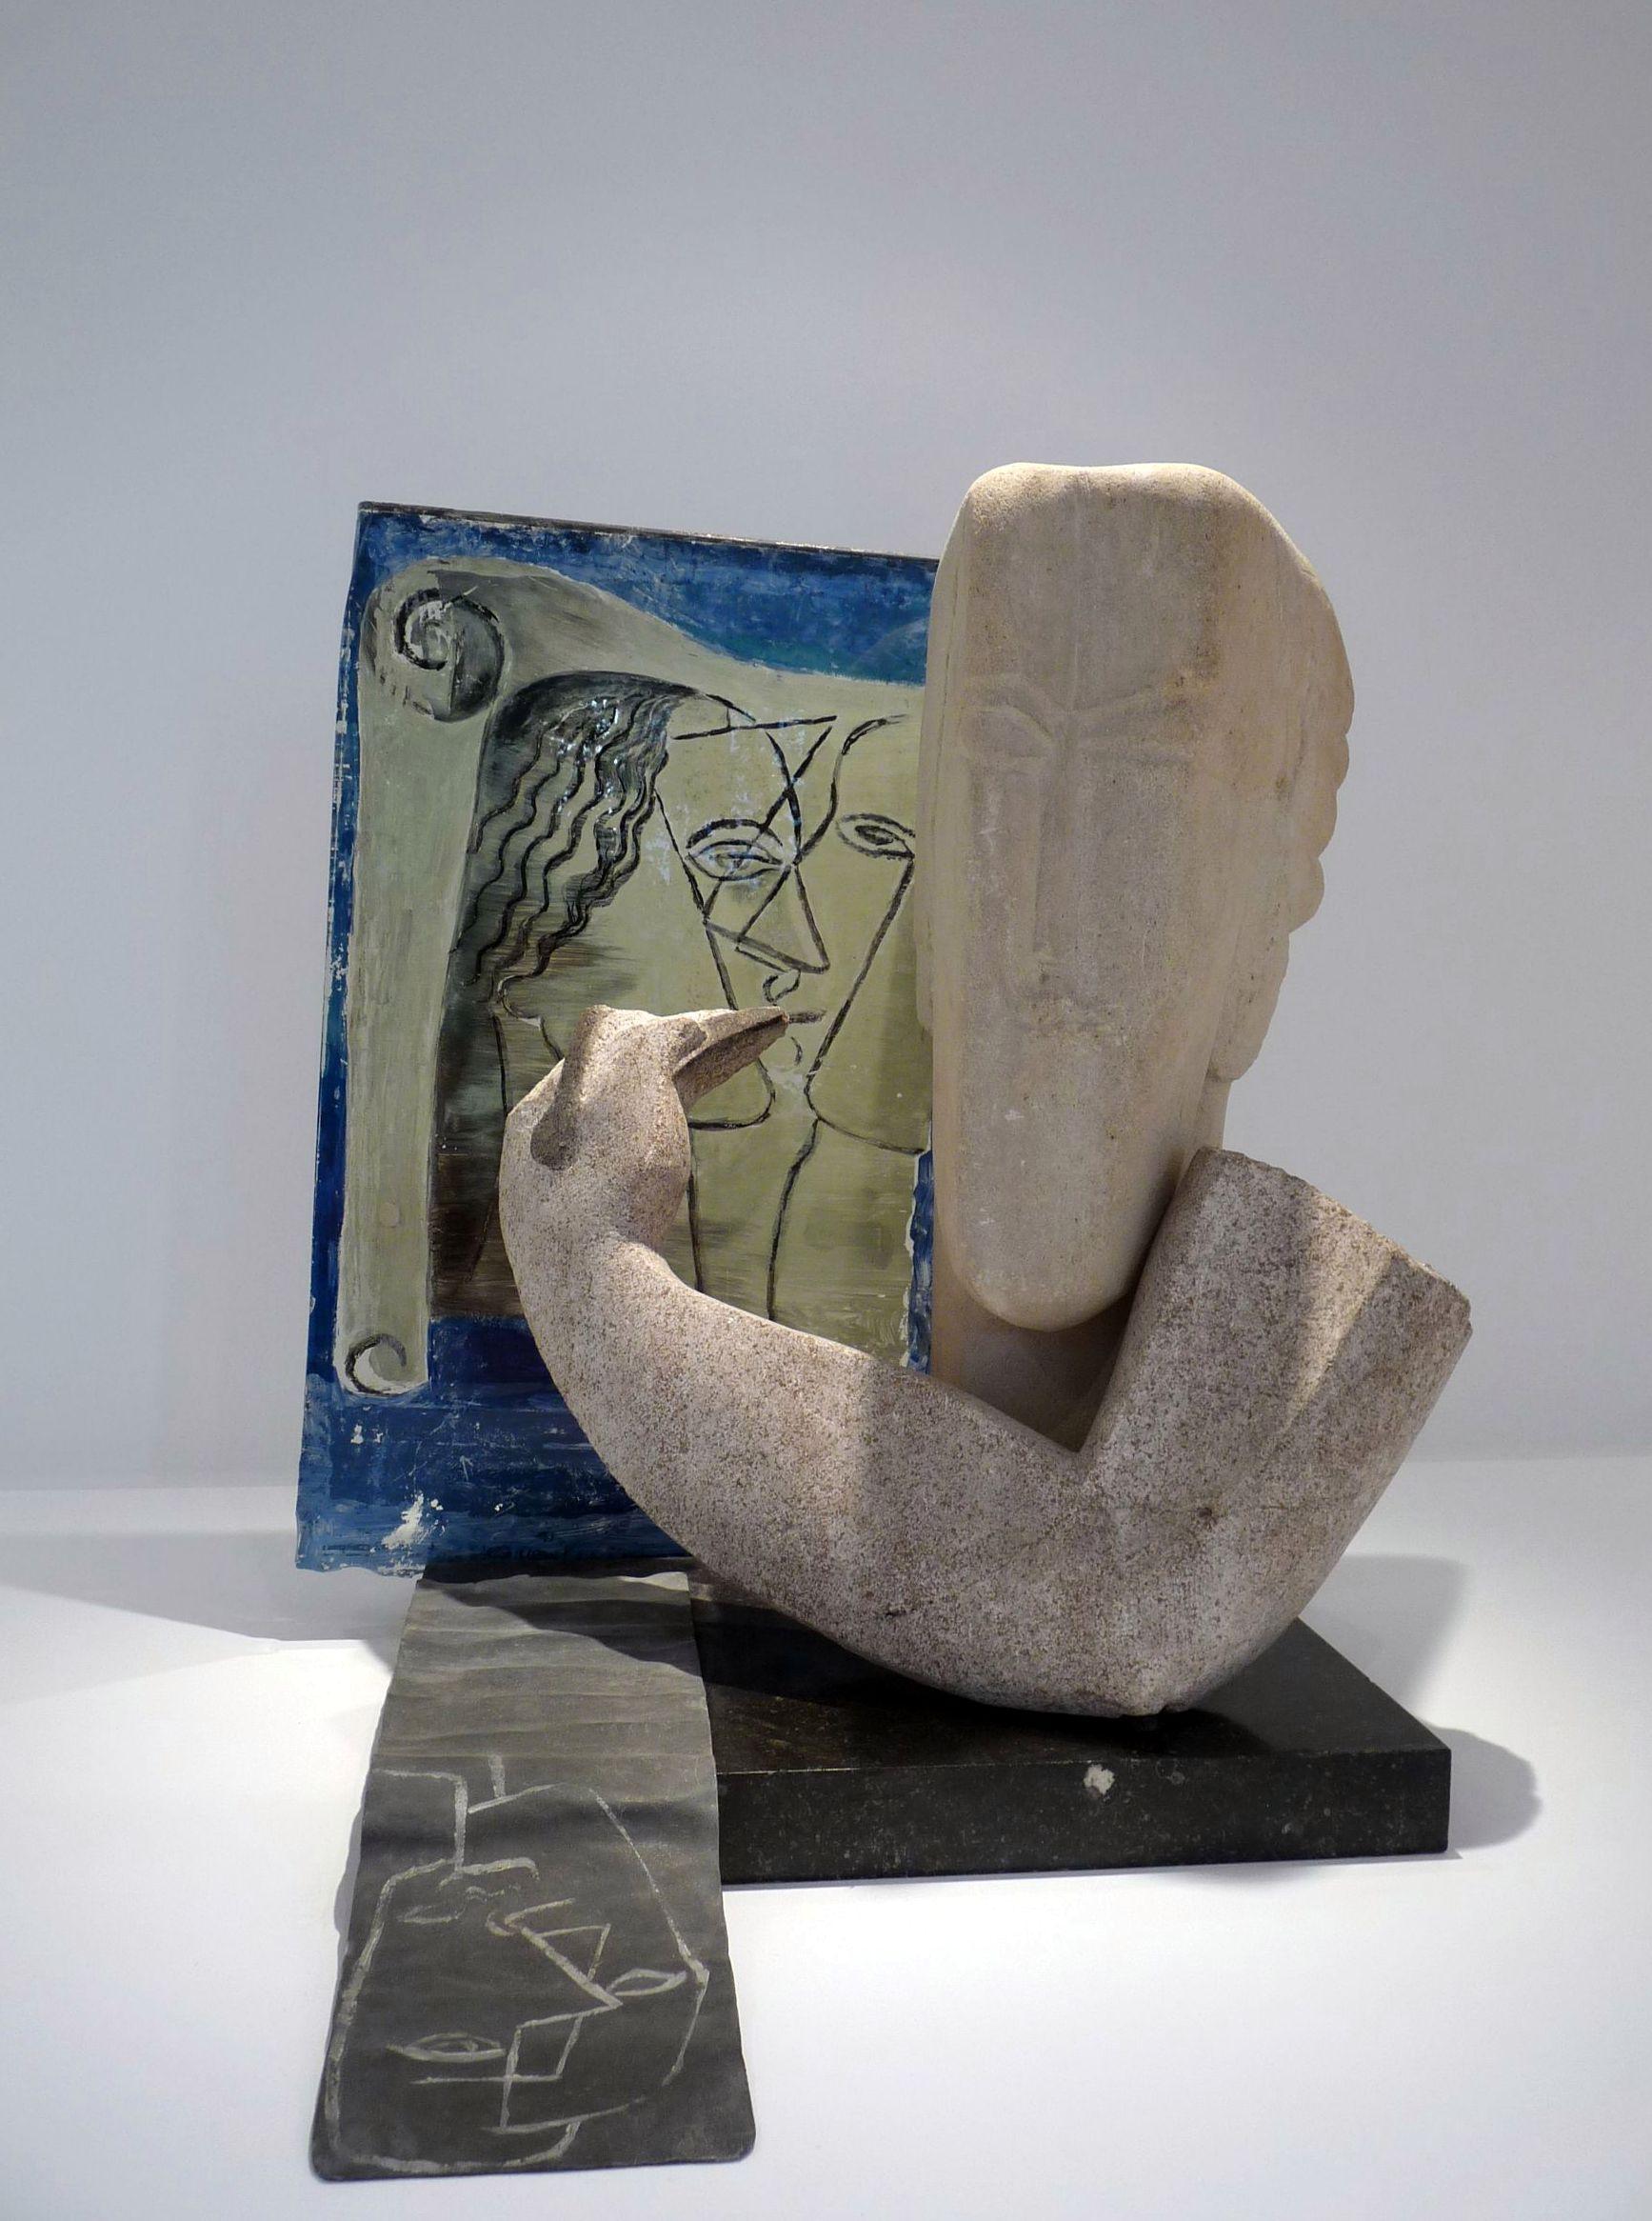 1929-49 Zadkine Osip, Le Sculpteur, Musée Zadkine, Paris, cliché JFMartine_P1260671_JFMartine